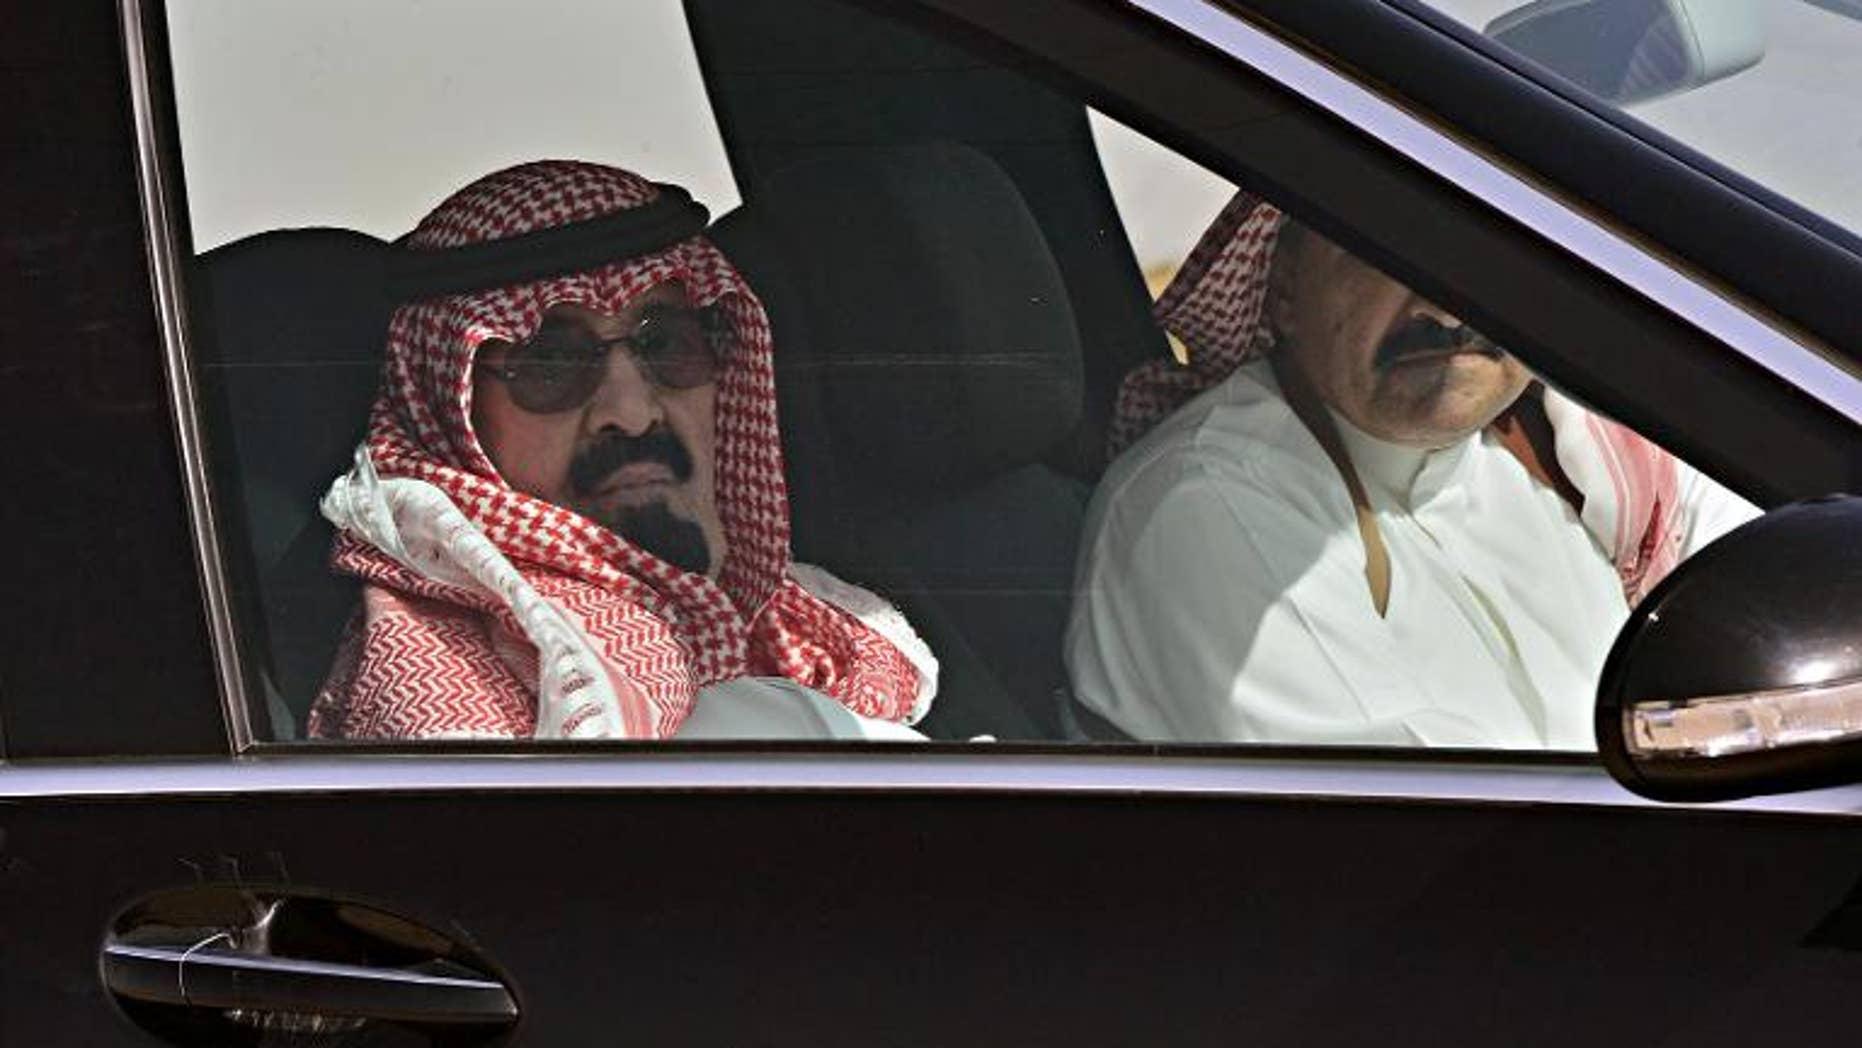 A picture released on March 3, 2013 shows King Abdullah bin Abdulaziz al-Saud arriving at Rawdat al-Khuraim to visit his farm